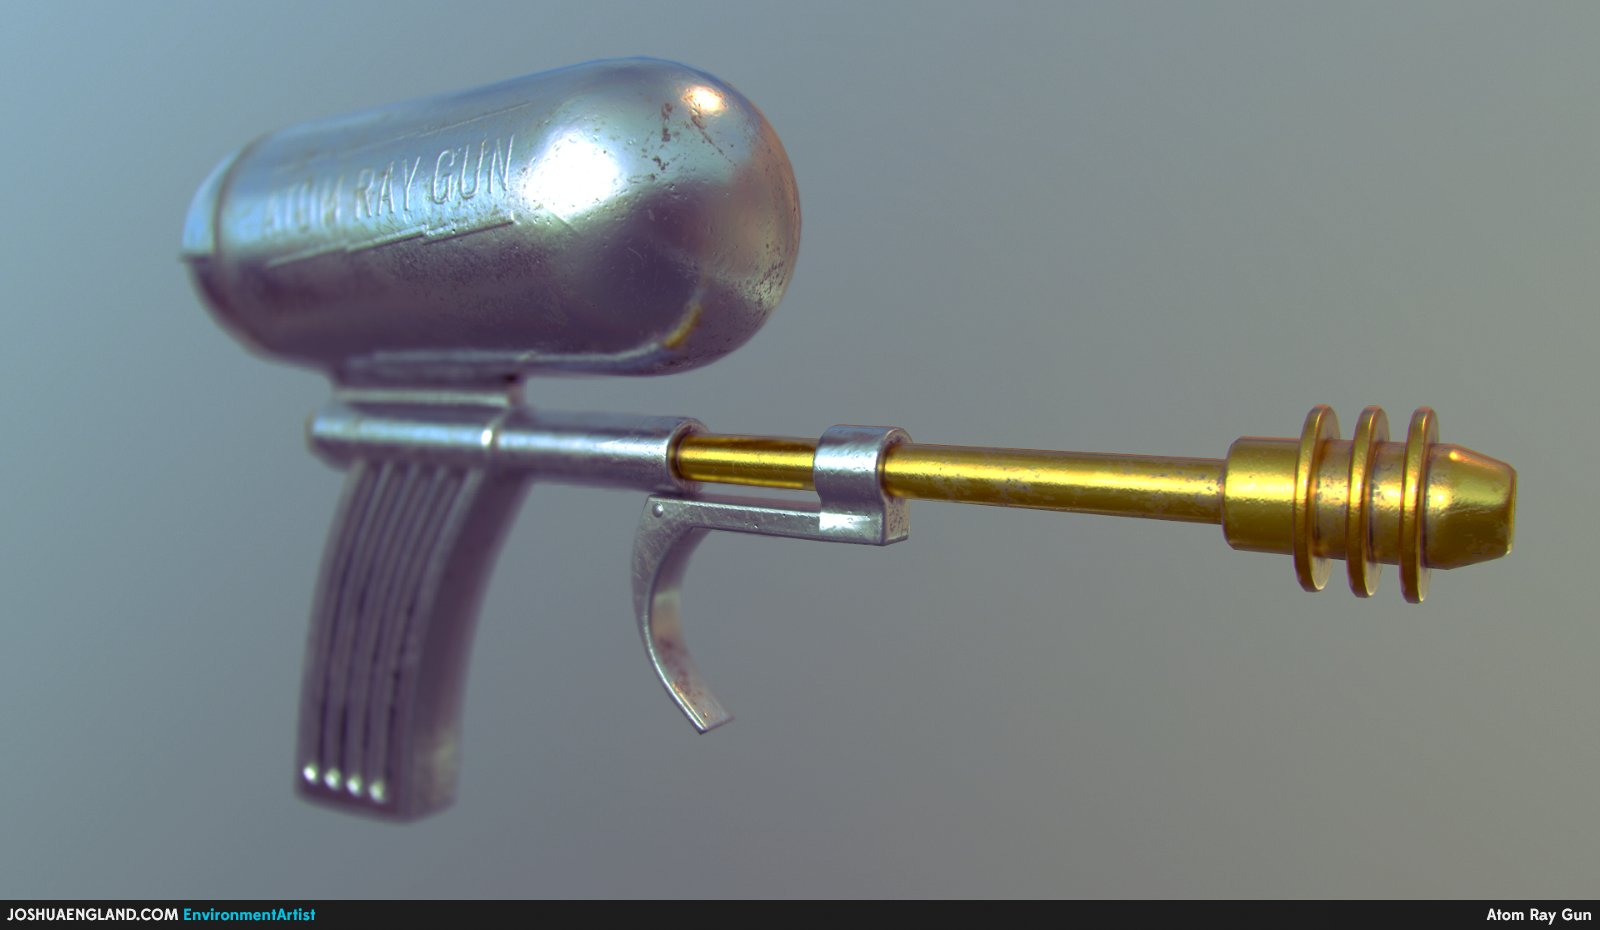 Atom Ray Gun Beauty